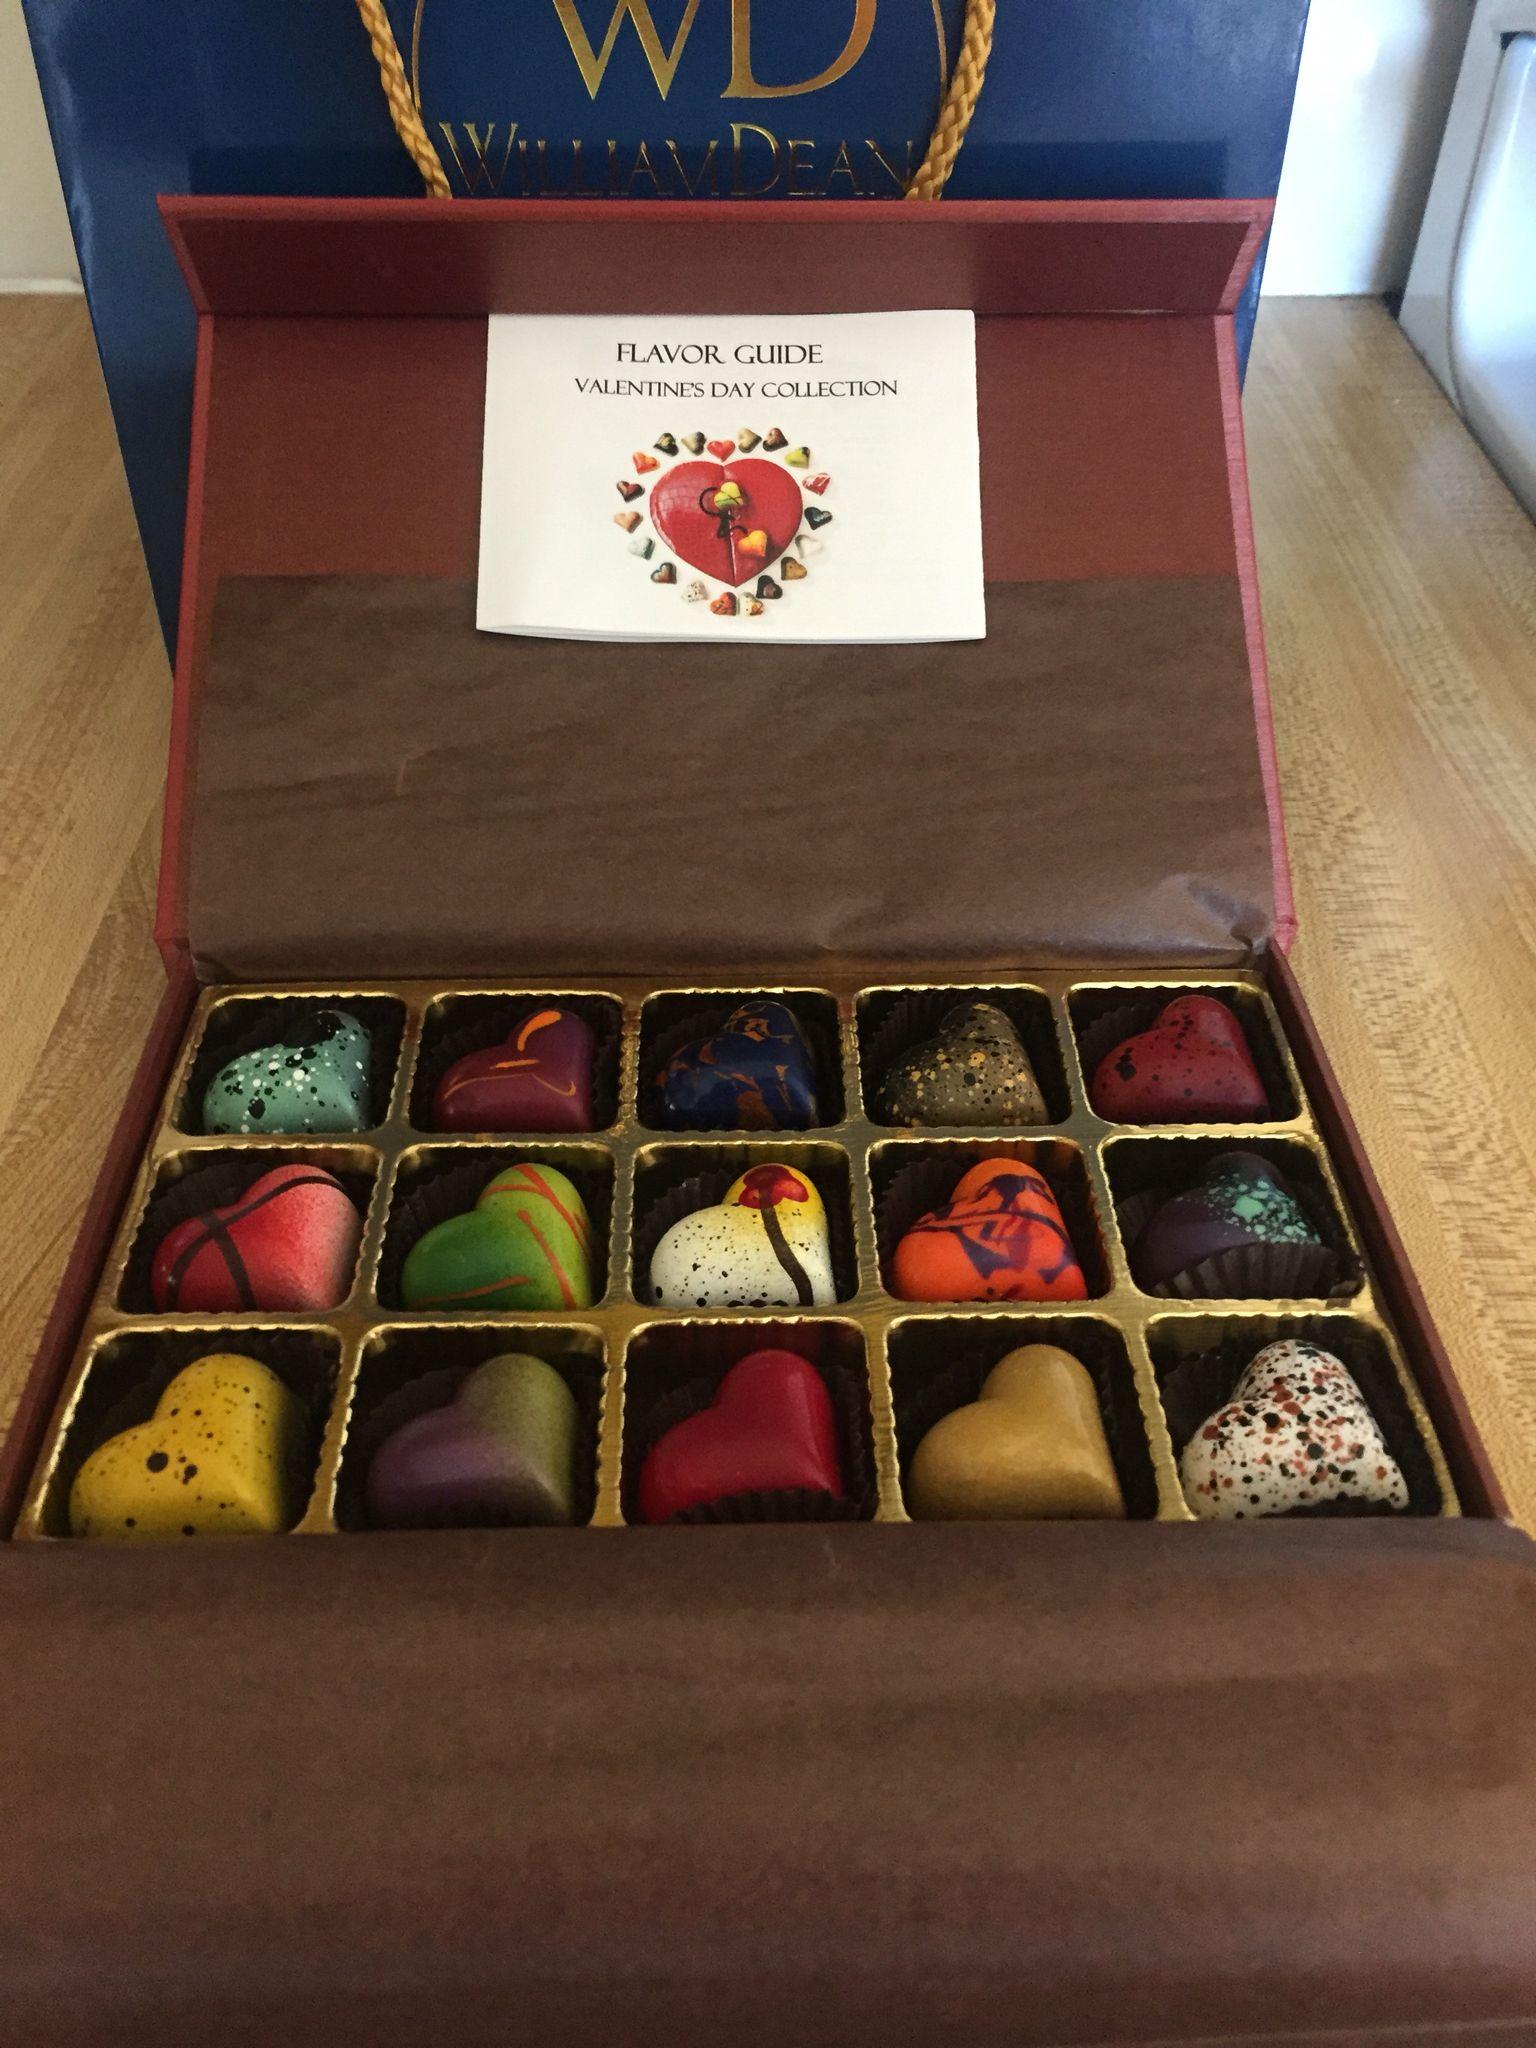 William Dean chocolates! Heart Art! Delish! | ❤ ON | Pinterest ...